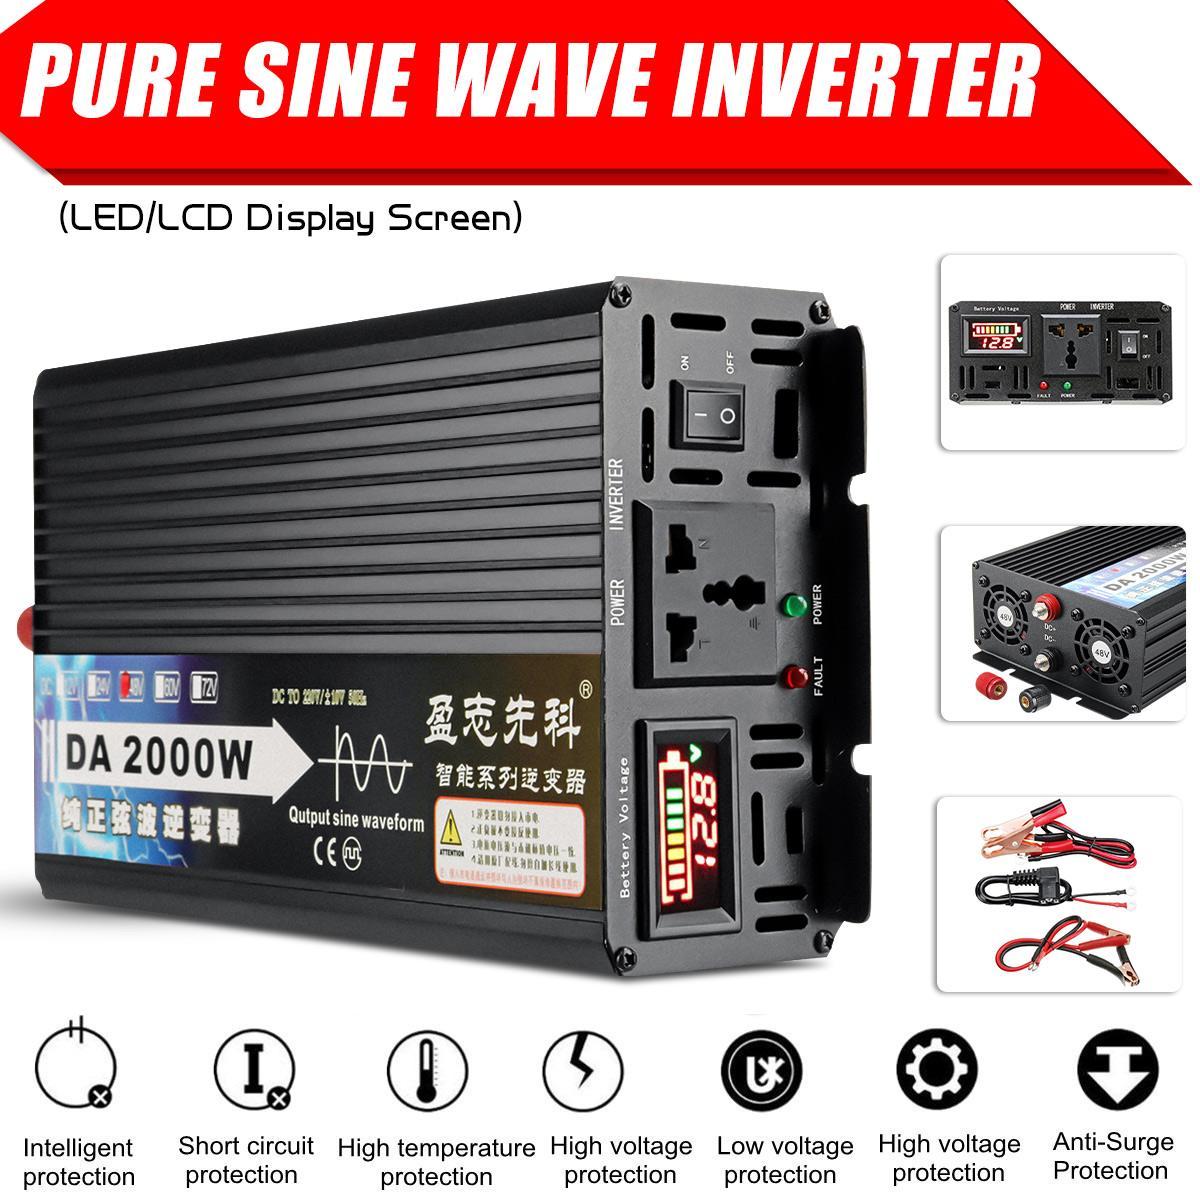 2000W / 3000W / 4000W Pure Sine Wave Power Inverter 12V/24V/48V/60V TO 220V LCD Display Voltage Converter2000W / 3000W / 4000W Pure Sine Wave Power Inverter 12V/24V/48V/60V TO 220V LCD Display Voltage Converter